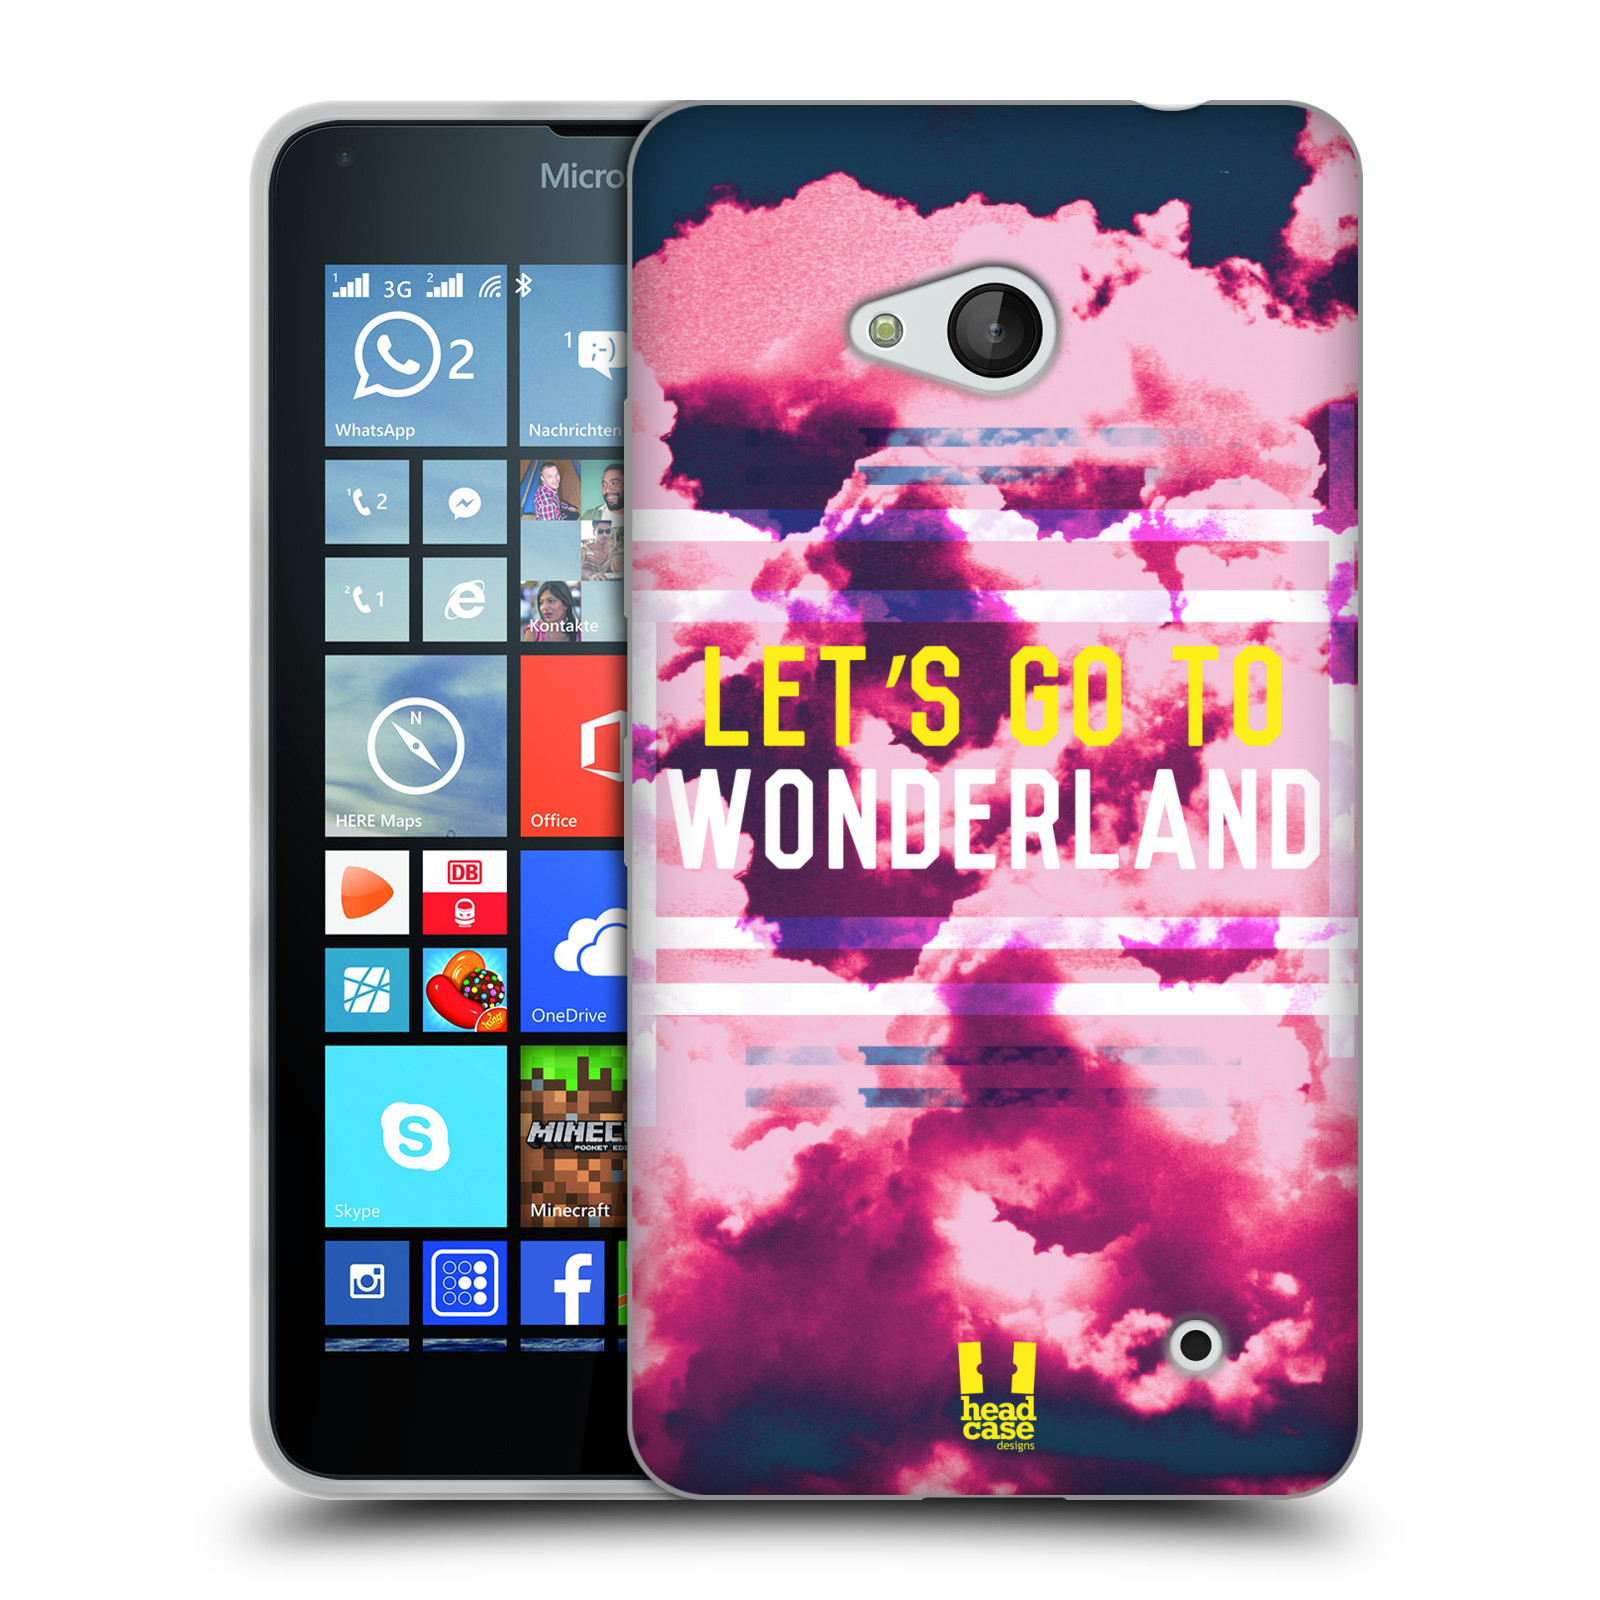 HEAD-CASE-DESIGNS-SKY-WONDERLAND-SOFT-GEL-CASE-FOR-NOKIA-PHONES-1